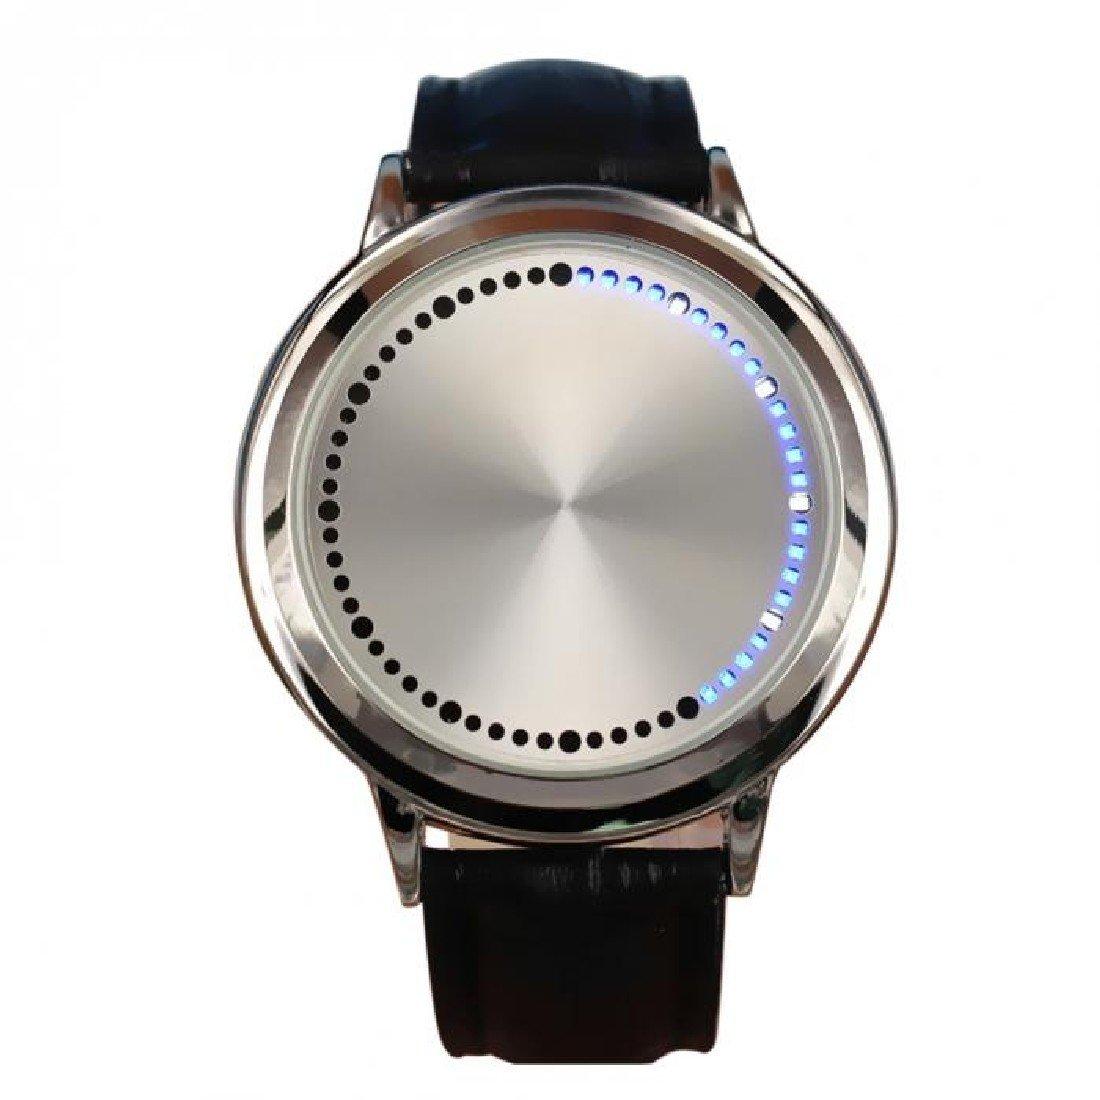 Unisex Pantalla táctil funda de piel banda reloj de pulsera deportivo reloj de pulsera LED intermitente blanco: Amazon.es: Relojes